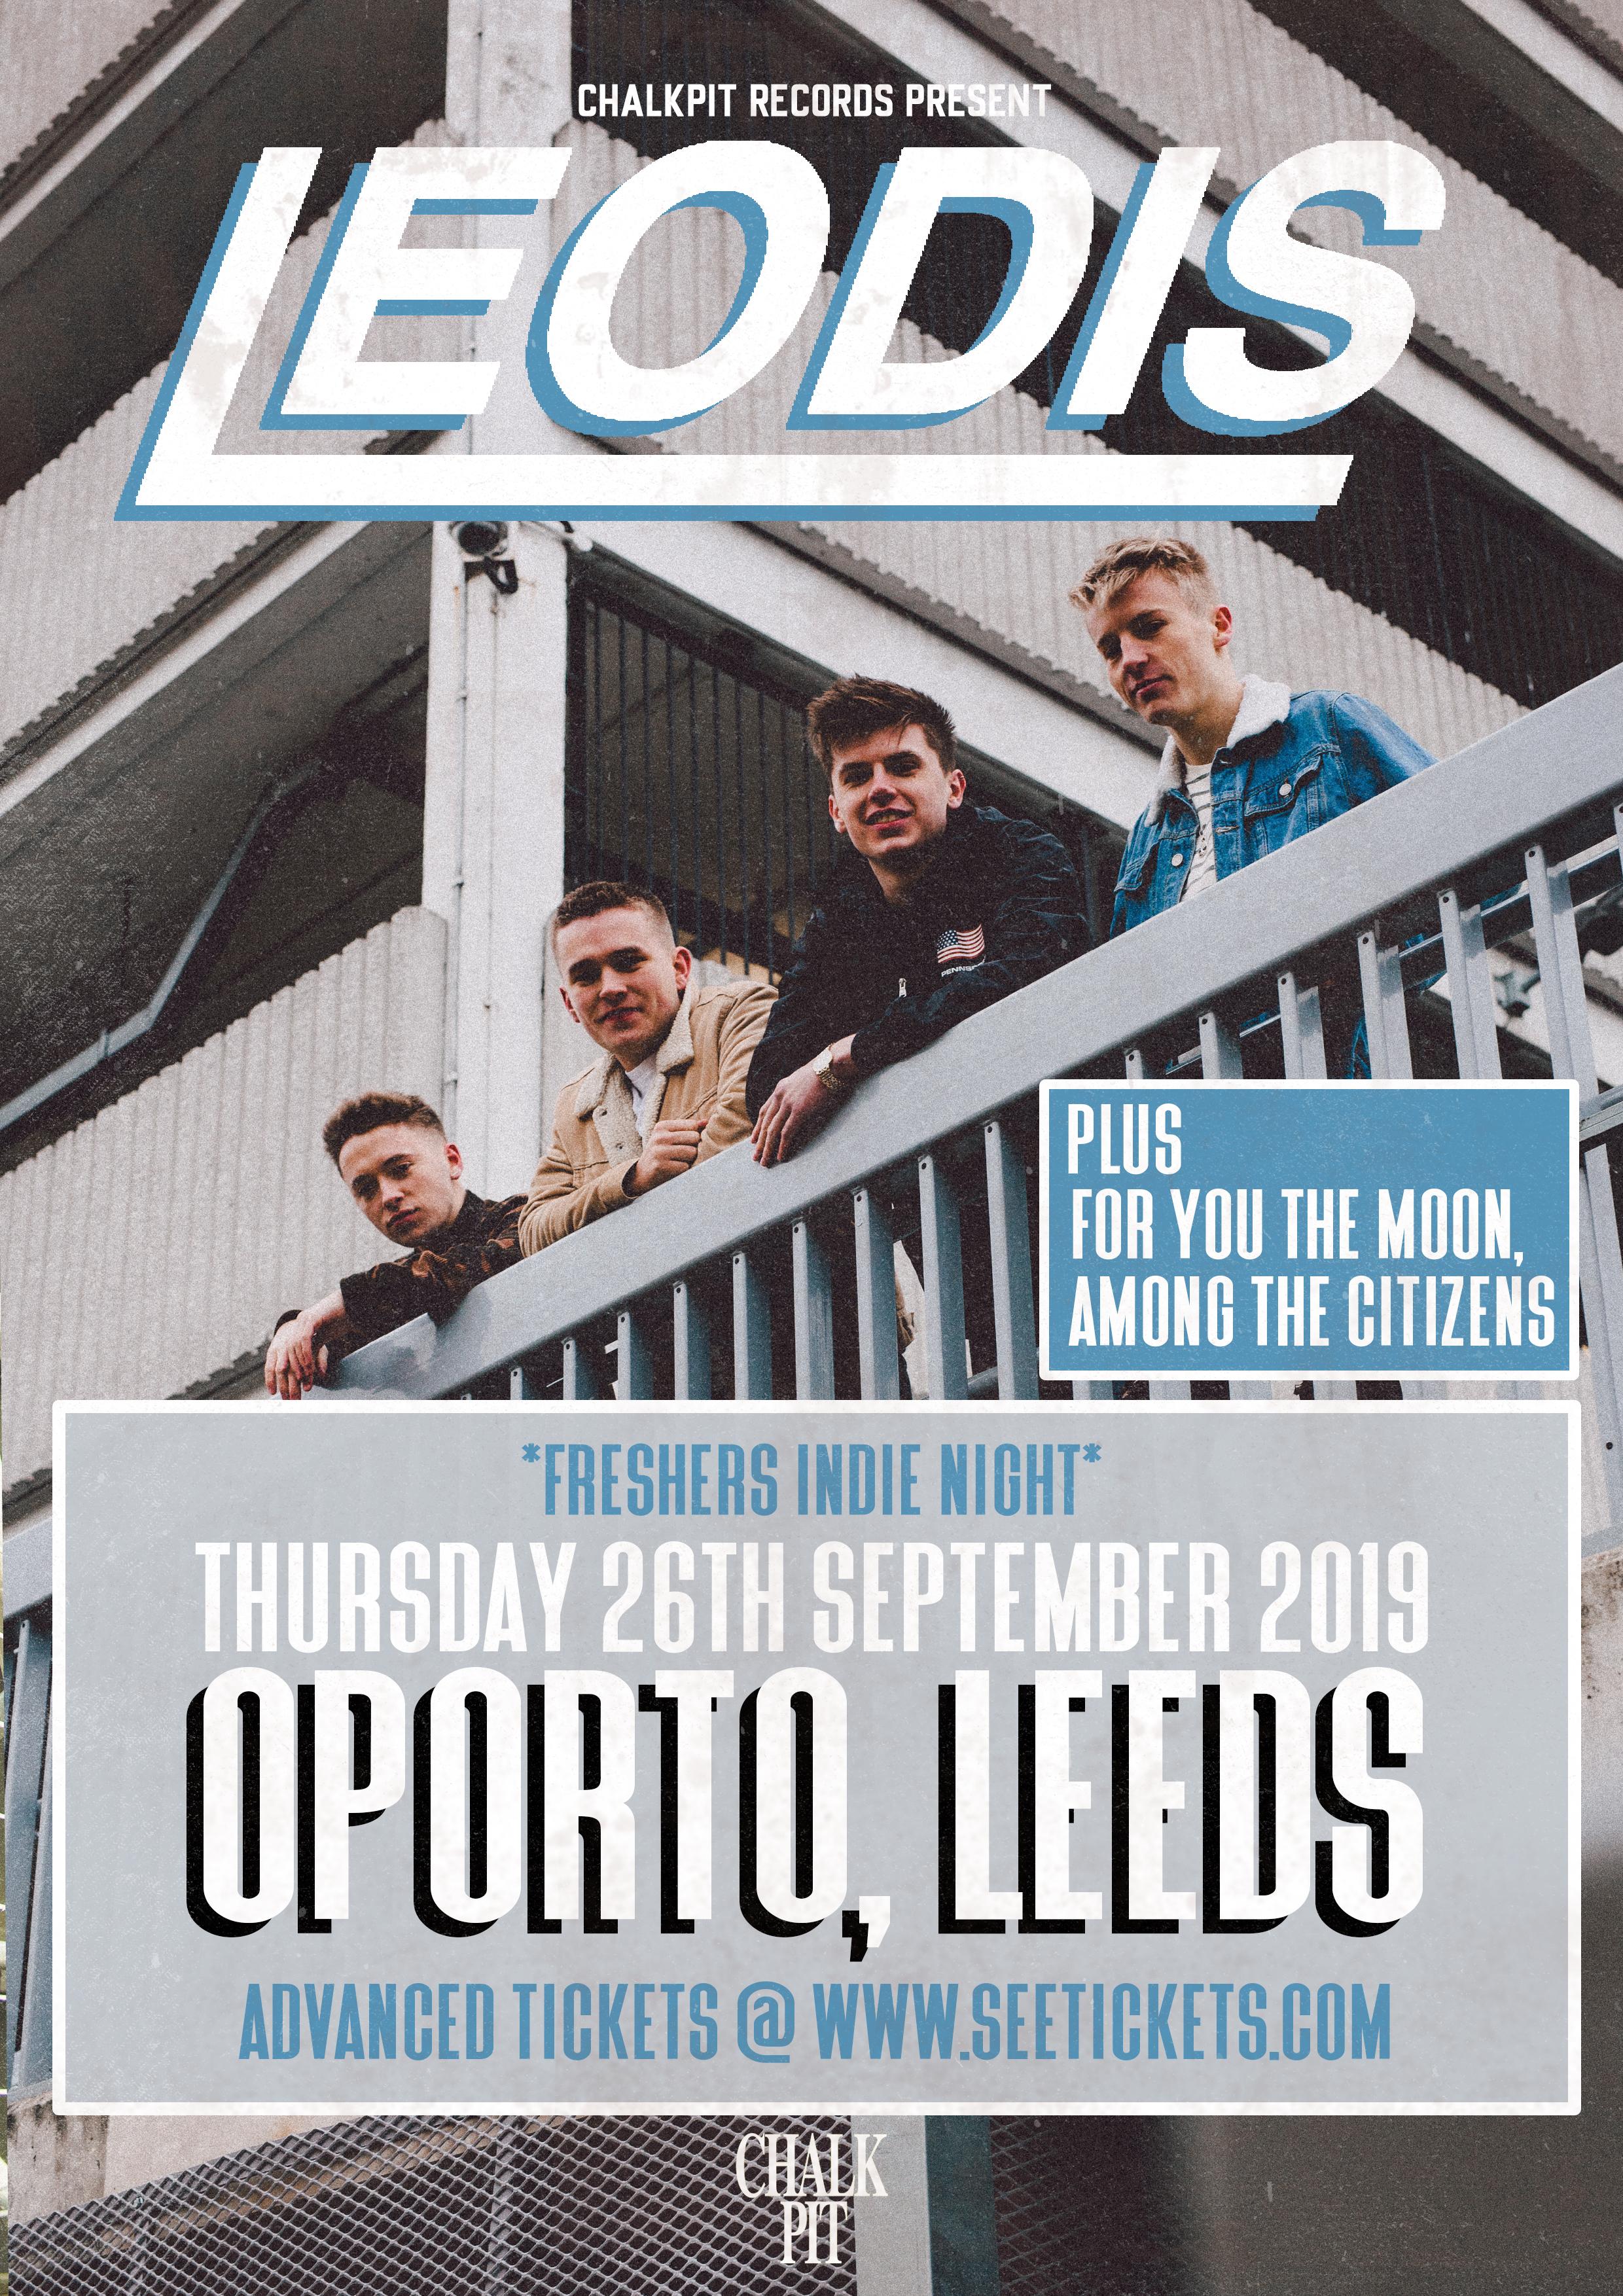 LEODIS - LIVE @ OPORTO, LEEDS